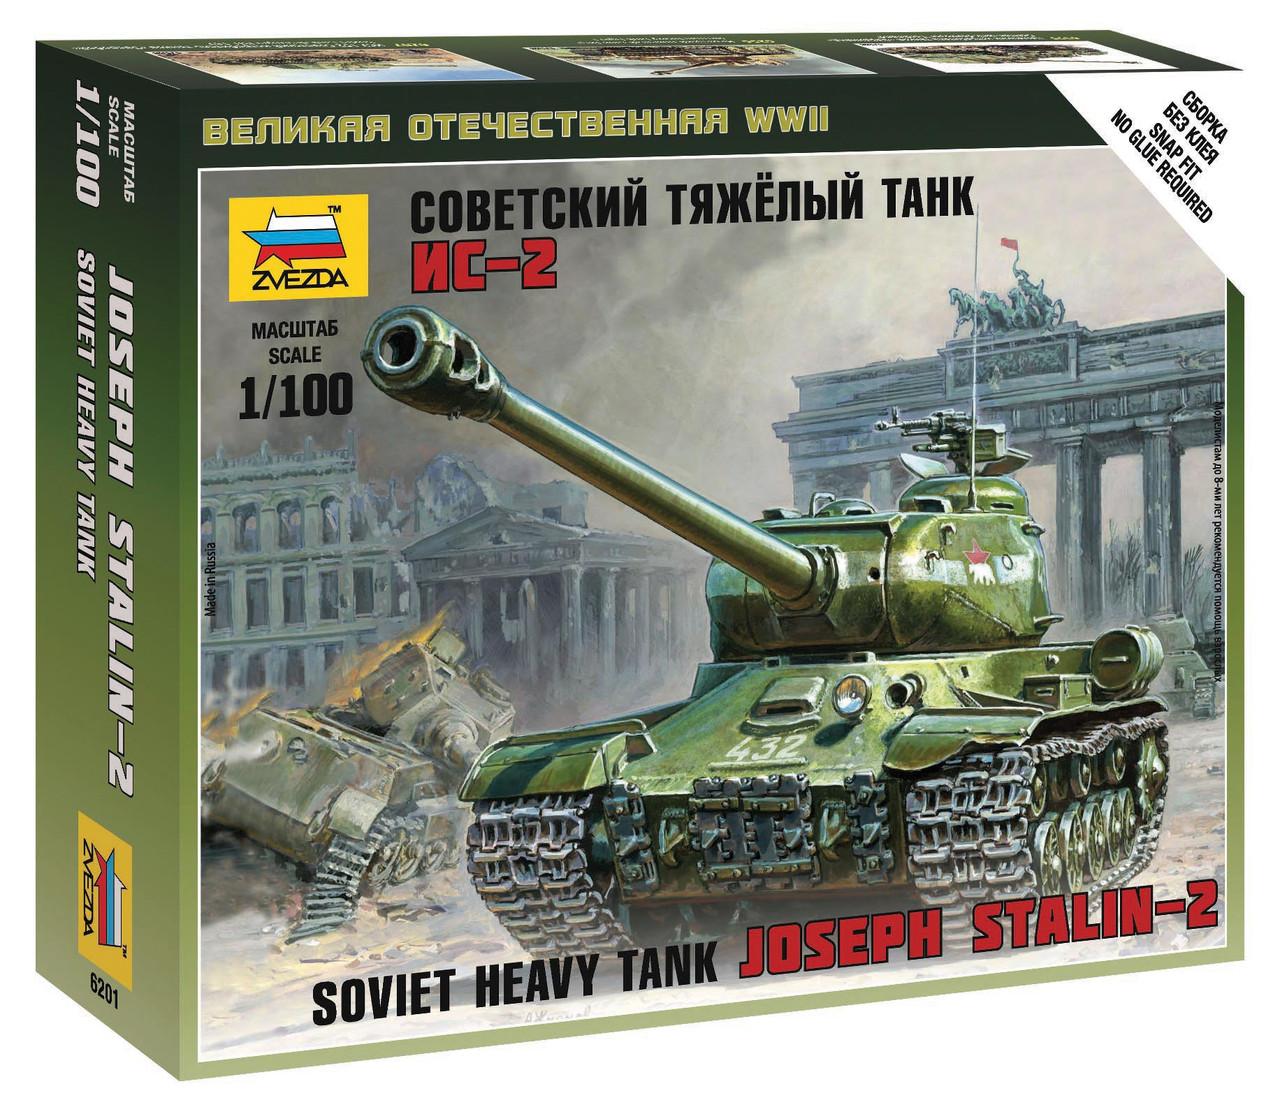 Модель советского тяжелого танка ИС-2. 1/100 ZVEZDA 6201